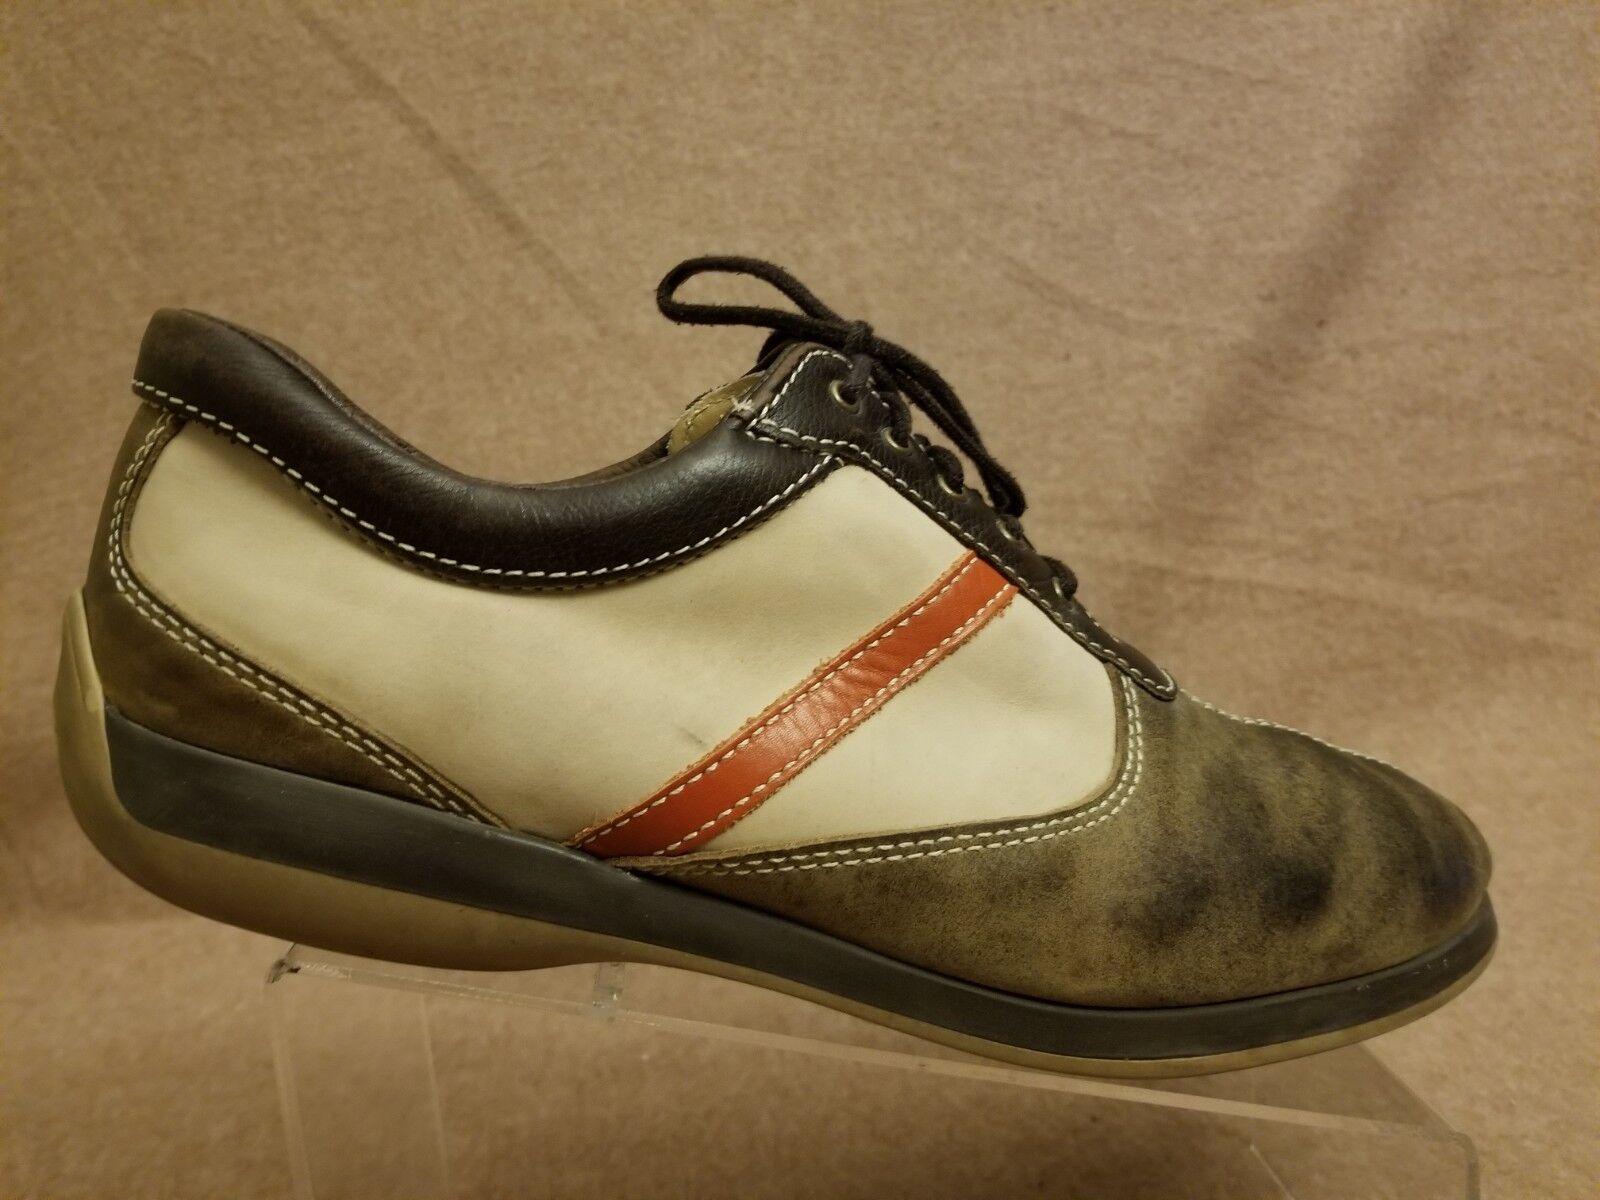 Allen Edmonds Nomad Men Brown Leather Dress Sports Casual Walking shoes Sz 12 B